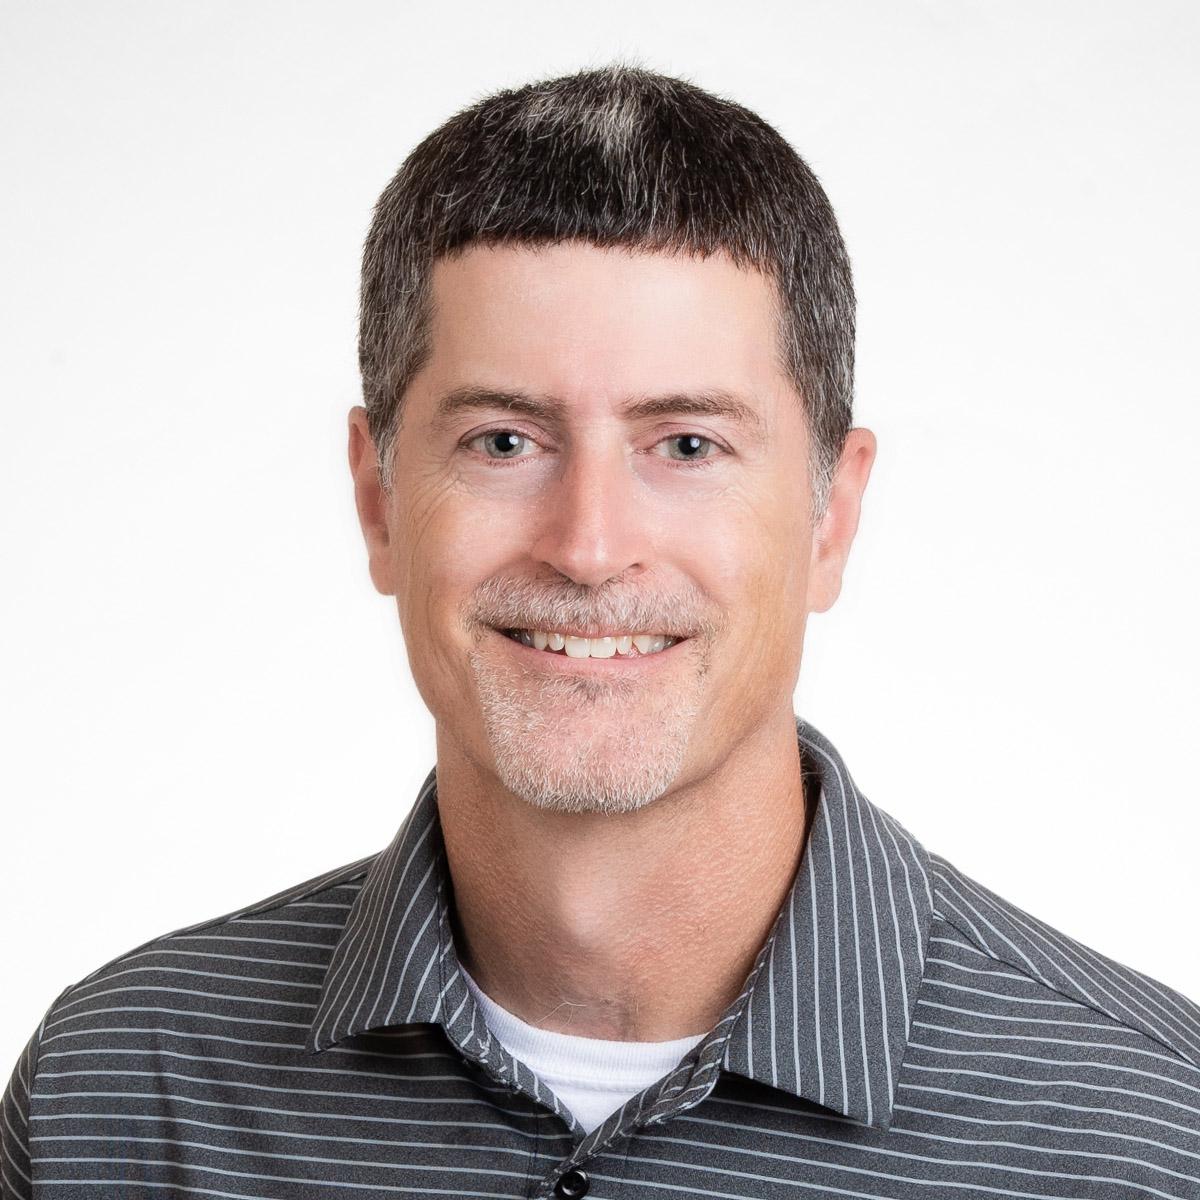 Steve Grassi, Chief Information Officer and Partner